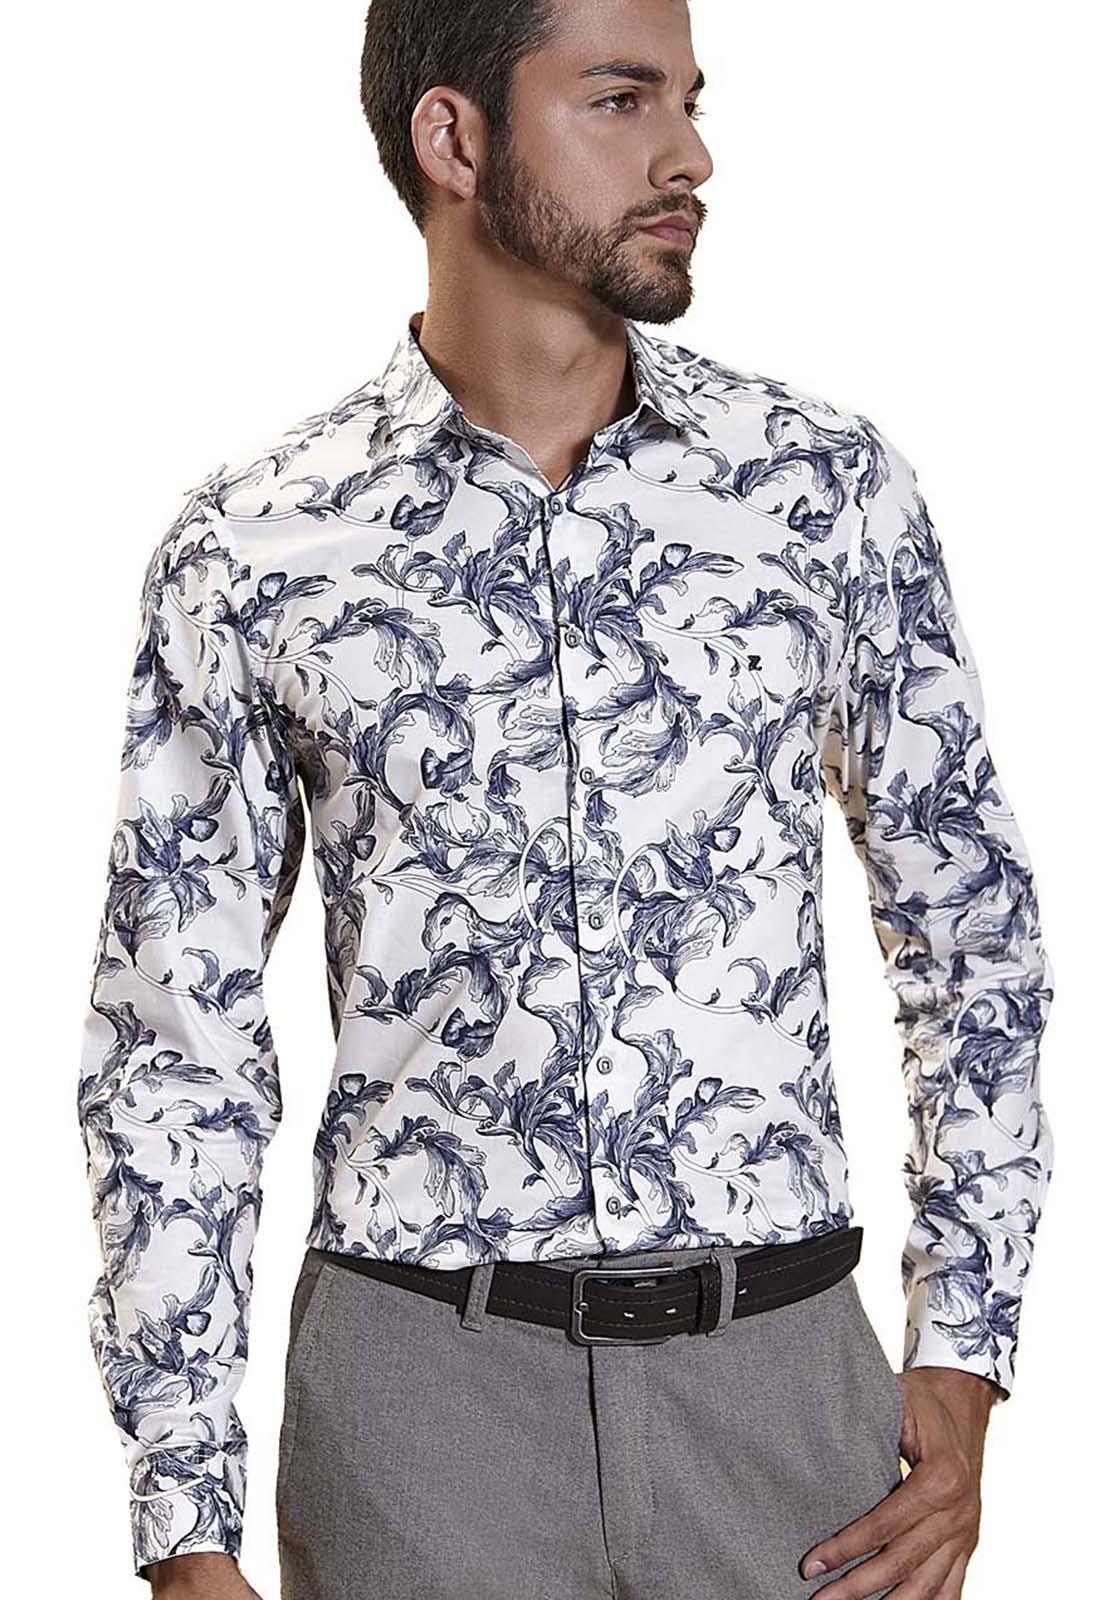 Camisa Fit Zaiko Estampada Floral Manga Longa 2244 Branco